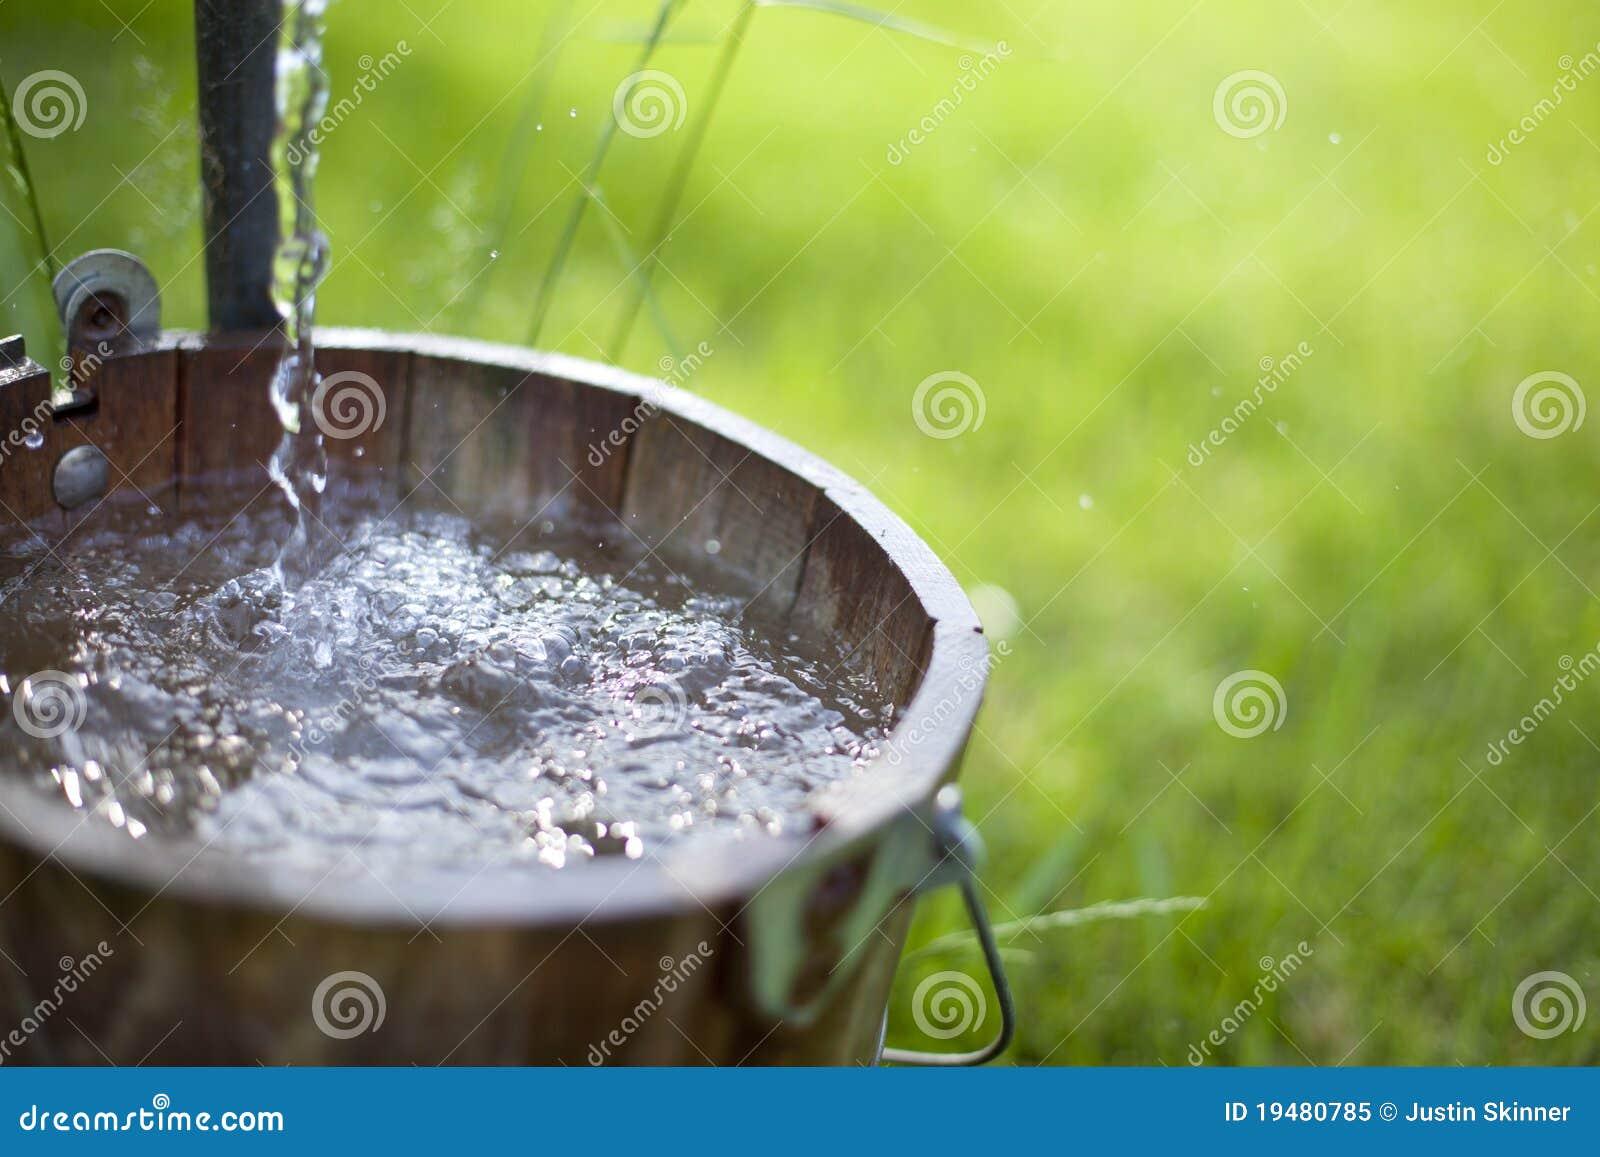 Pump It Up Prices >> Water Splashing in Bucket stock image. Image of running ...